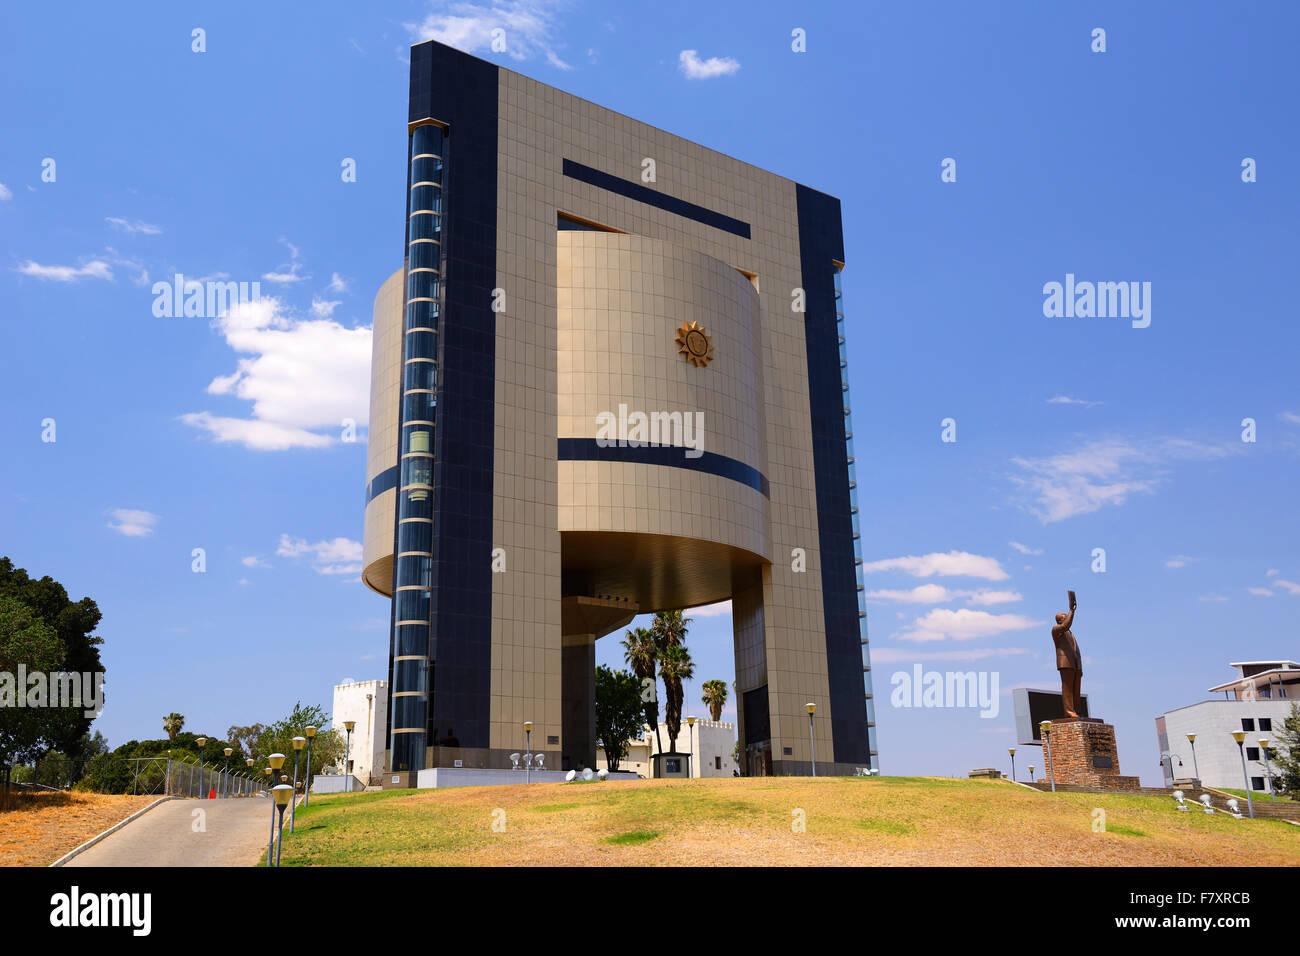 Independence Memorial Museum in Windhoek, Namibia - Stock Image